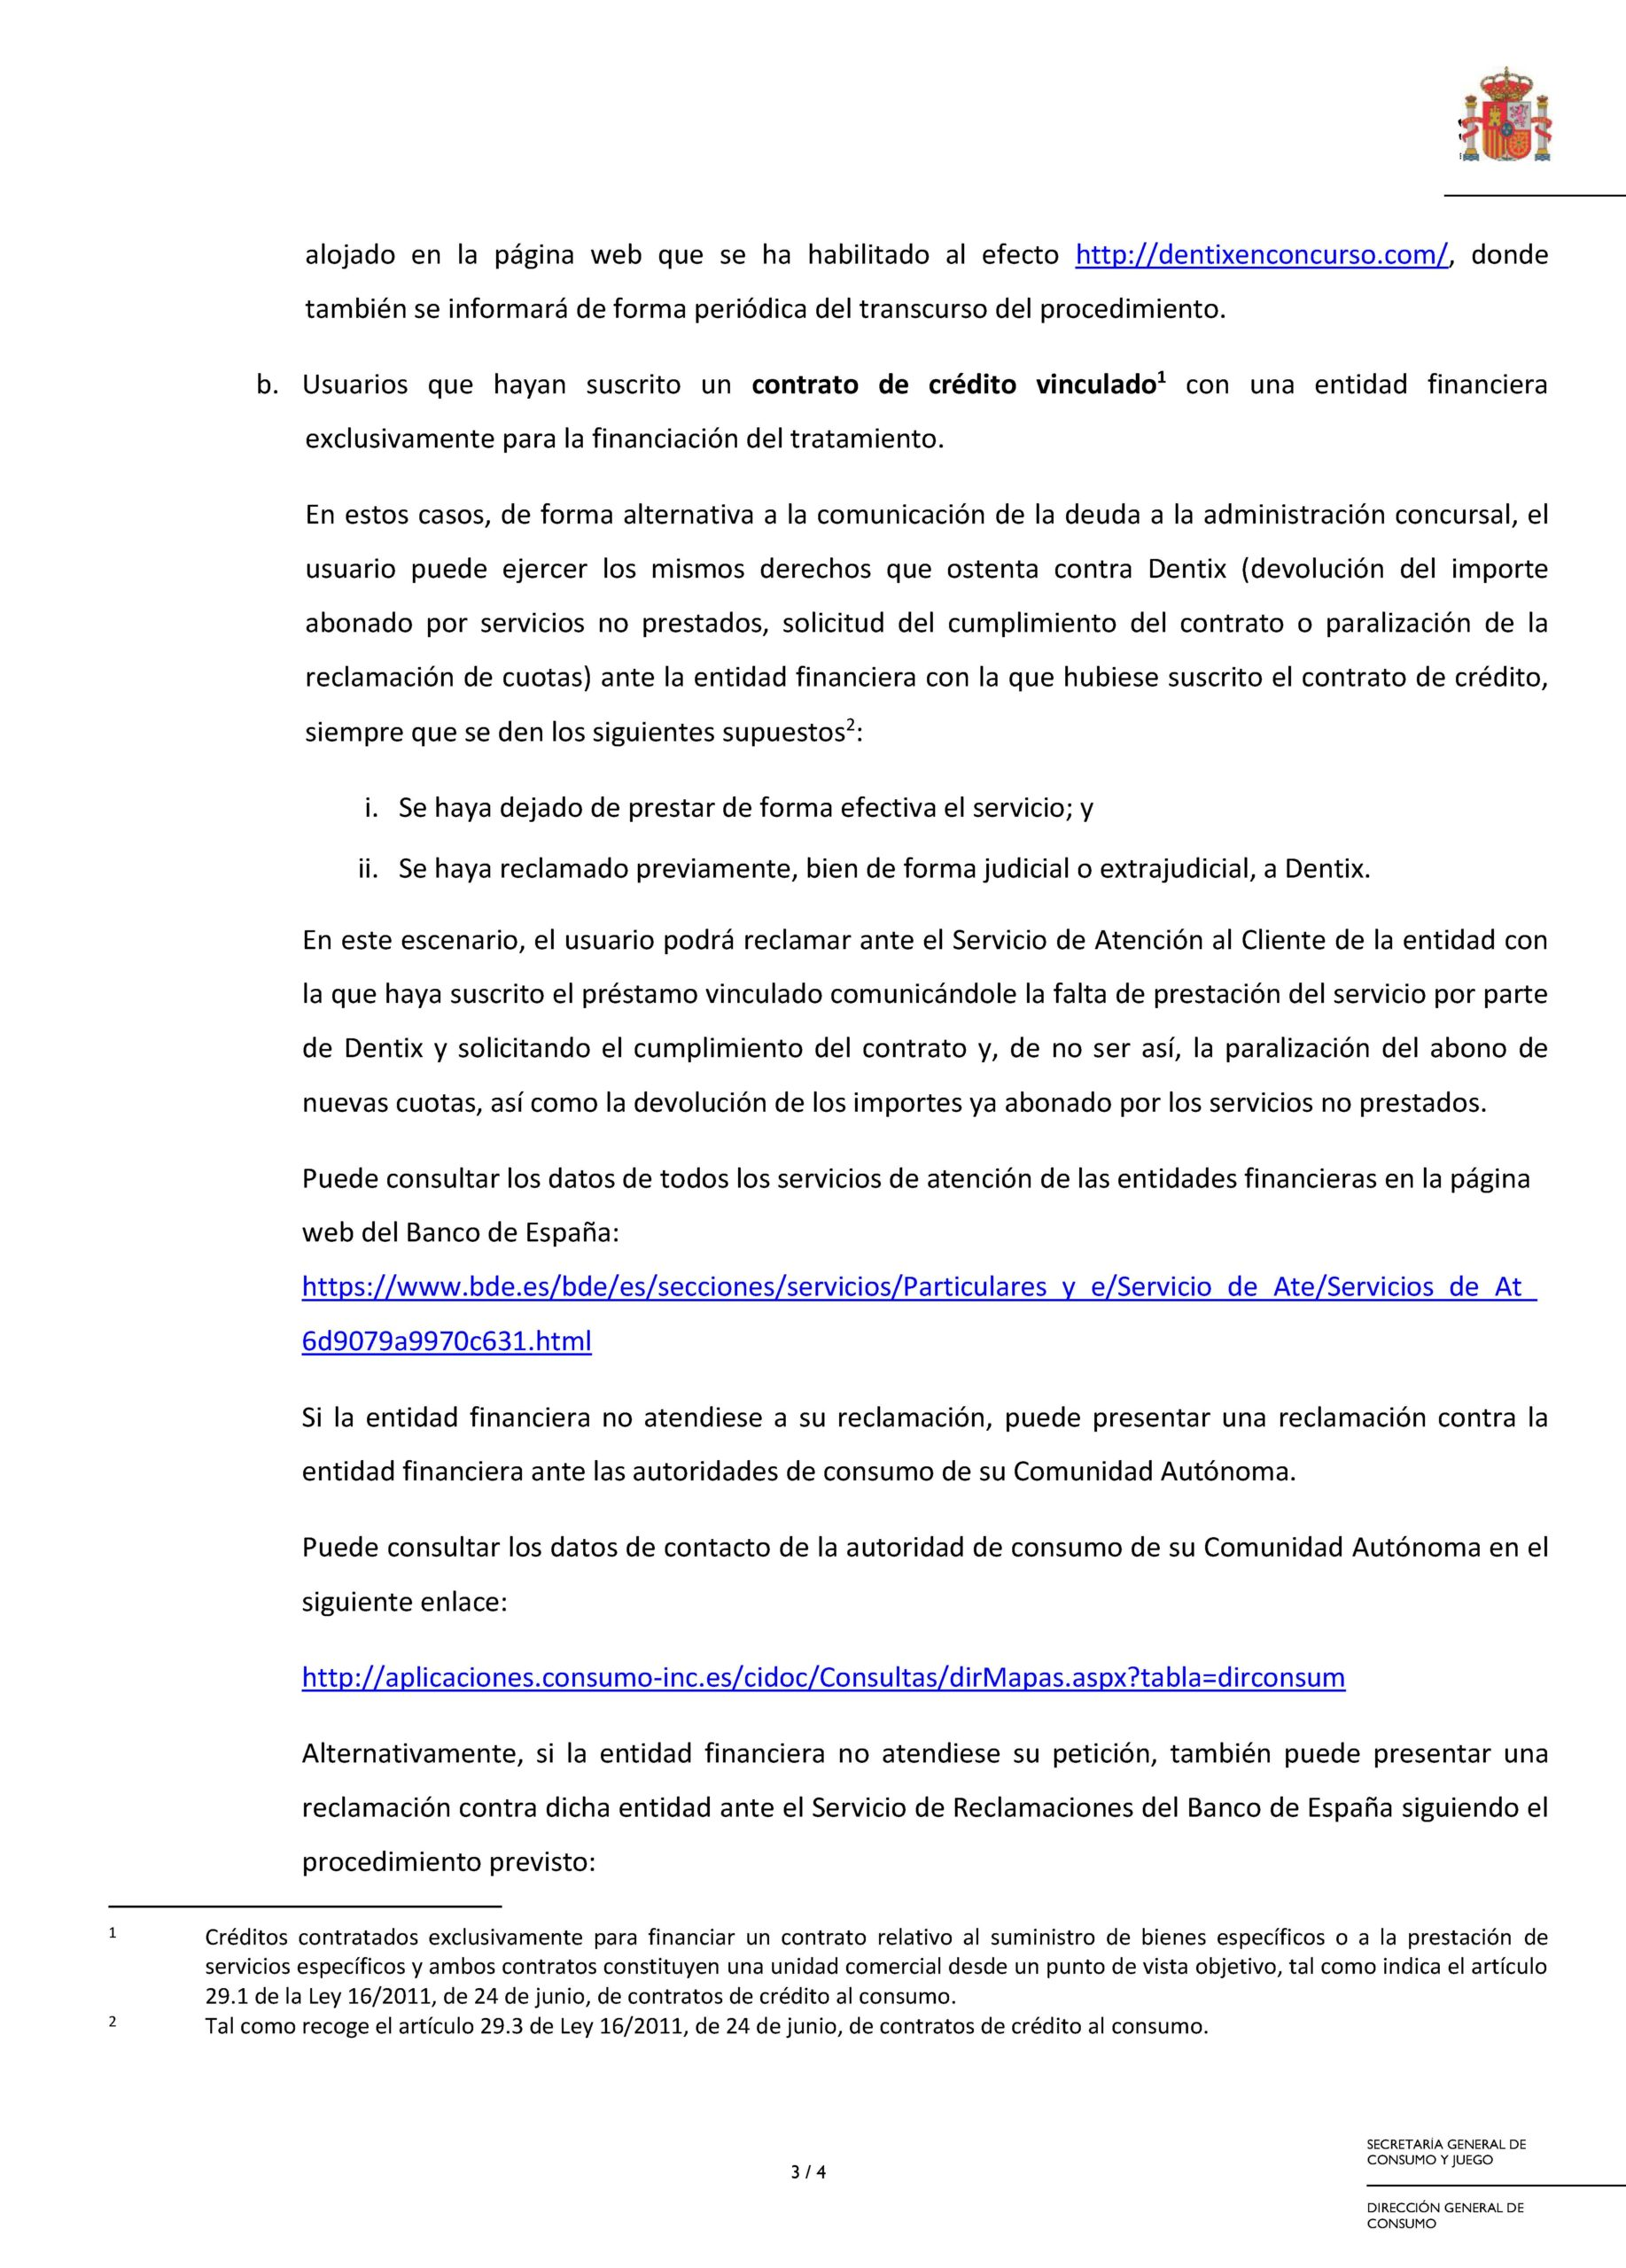 20201212 Nota informativa Dentix 2 actualizacion Pgina 3